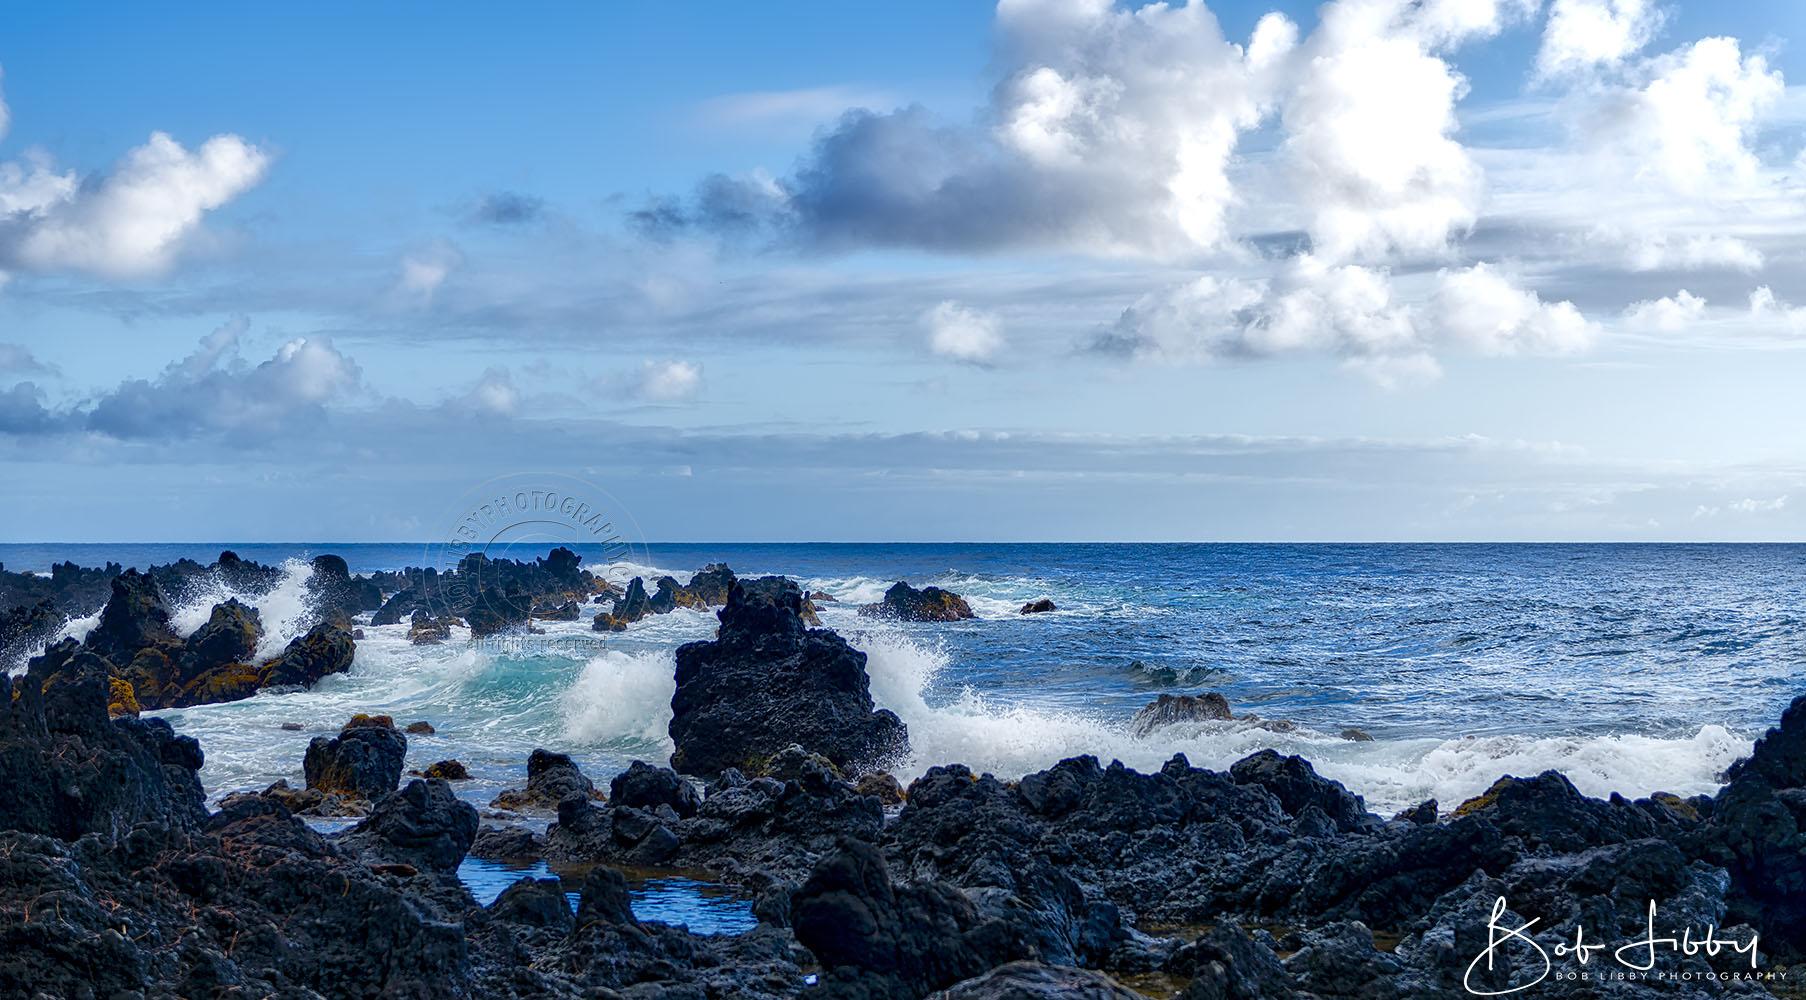 Hawaii, Lava Rocks in the Pacific Ocean